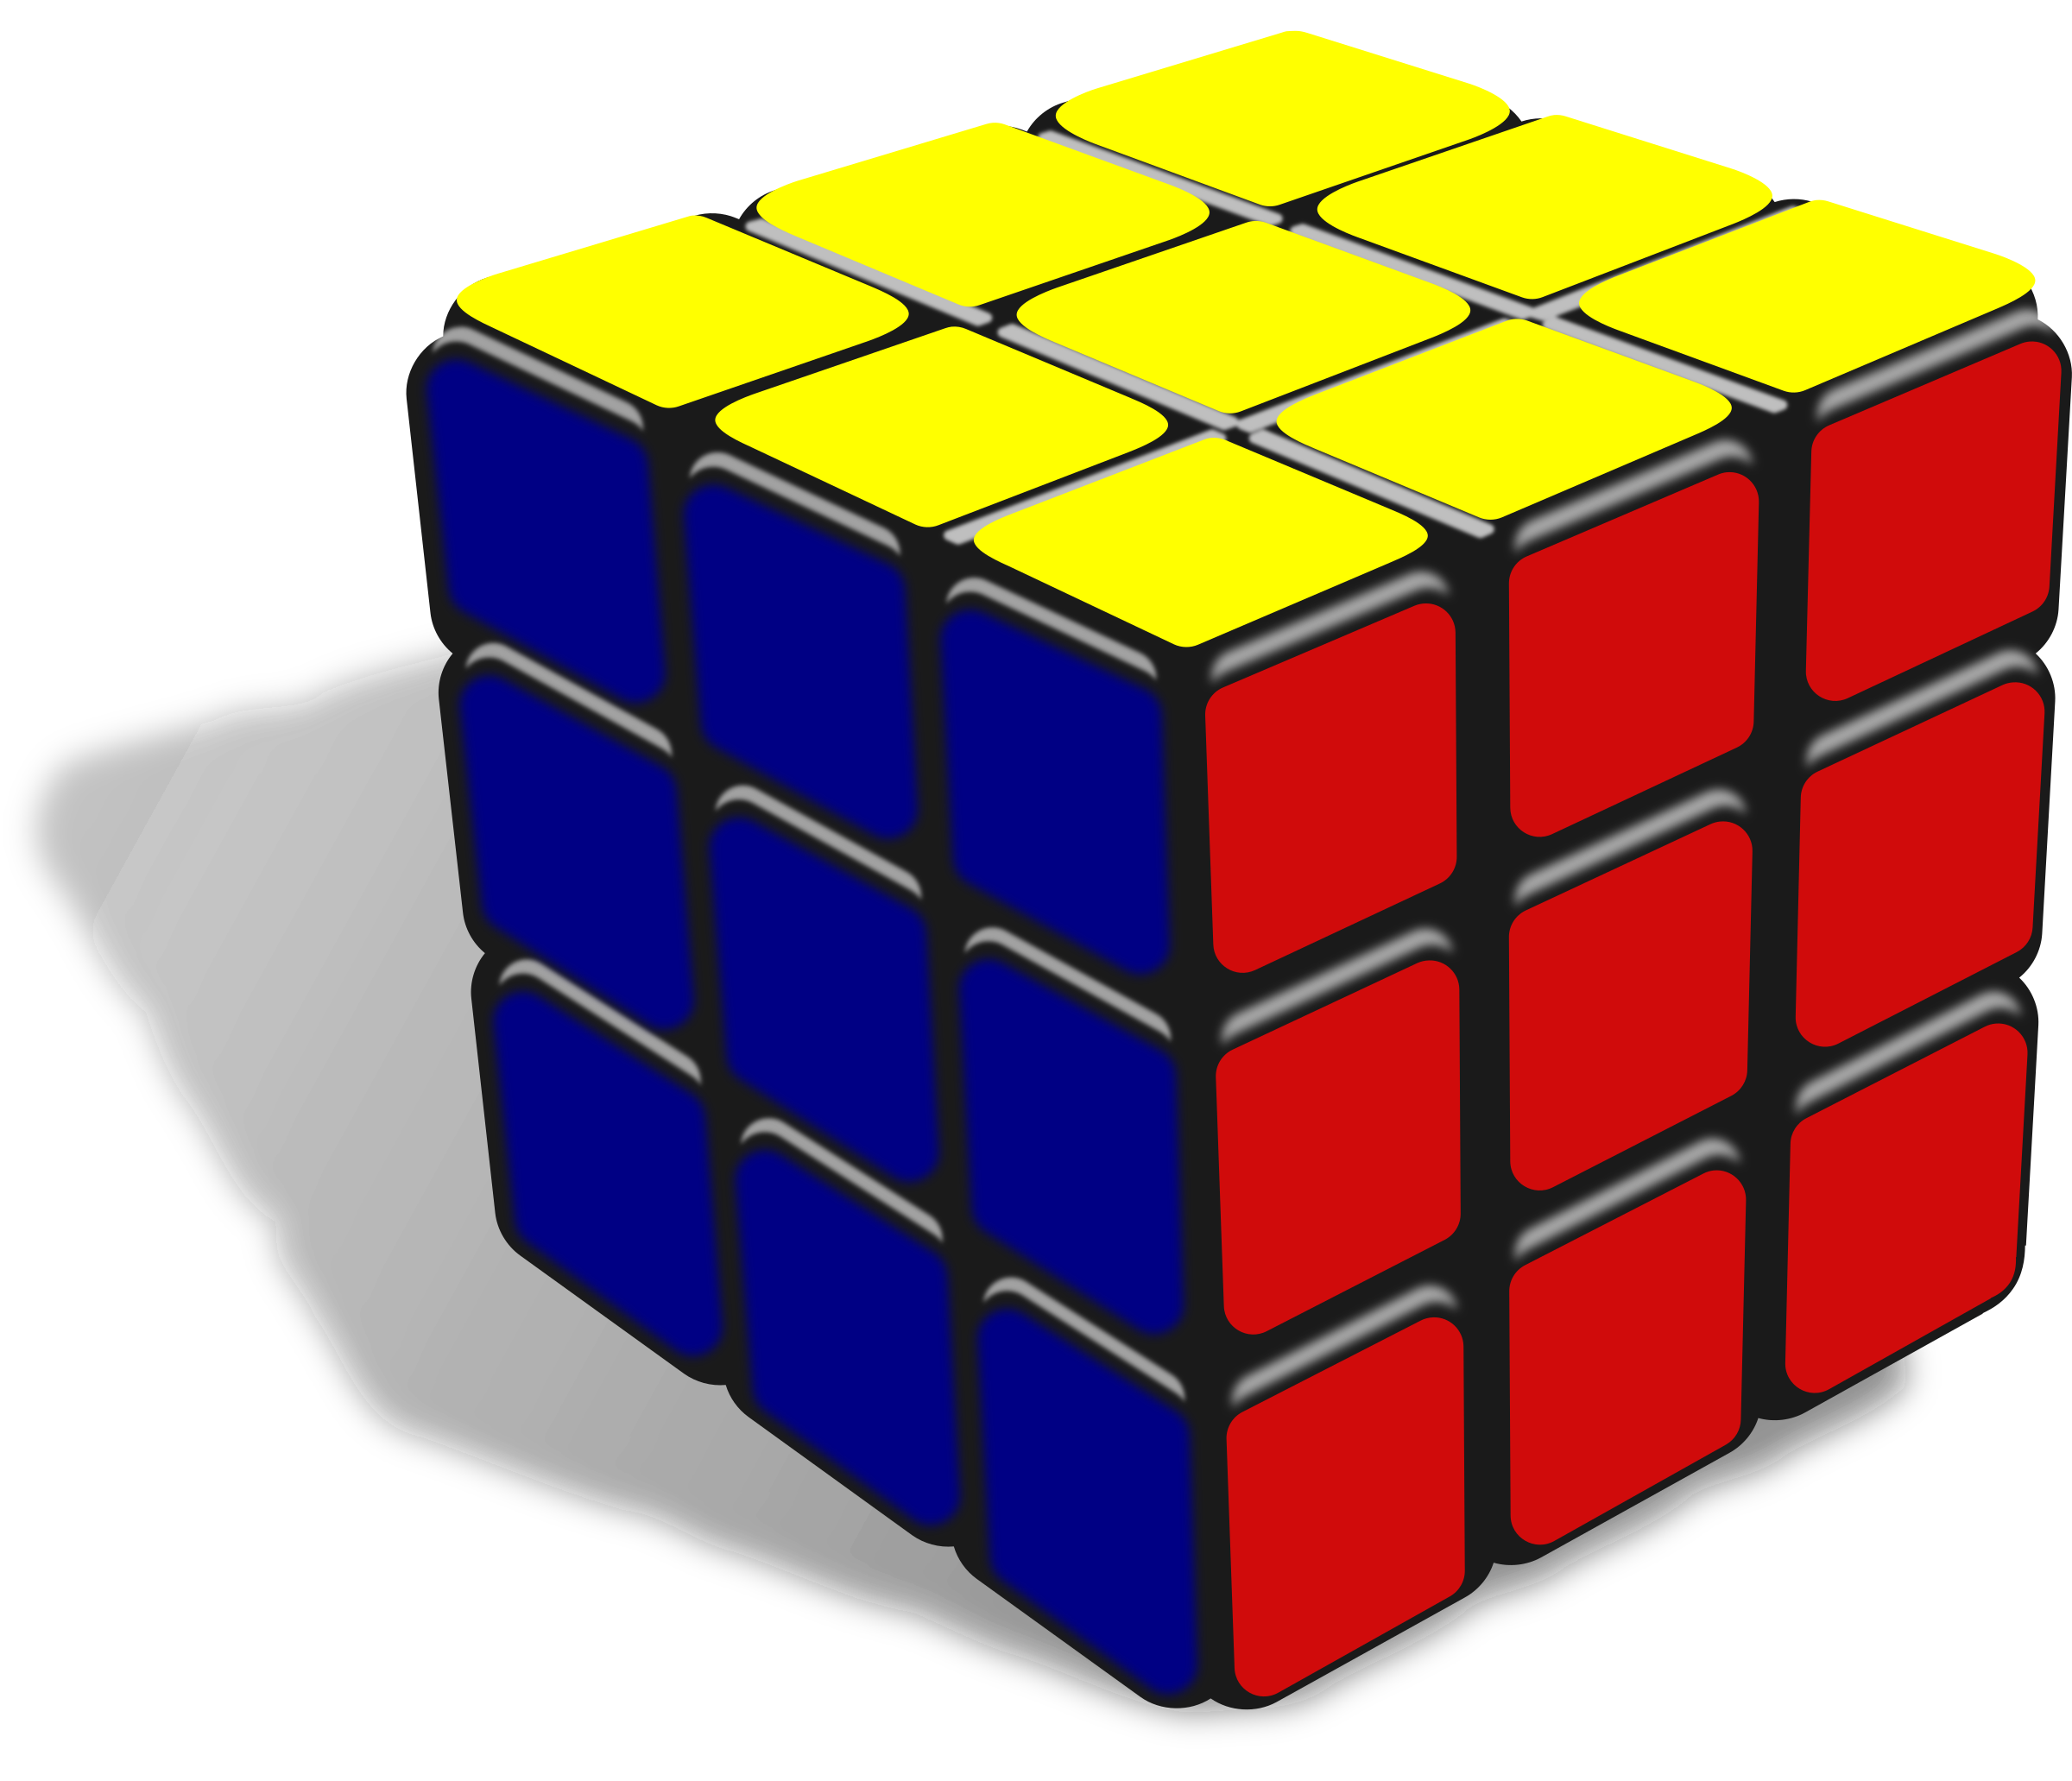 Cube clipart purple Cube Cube Clipart